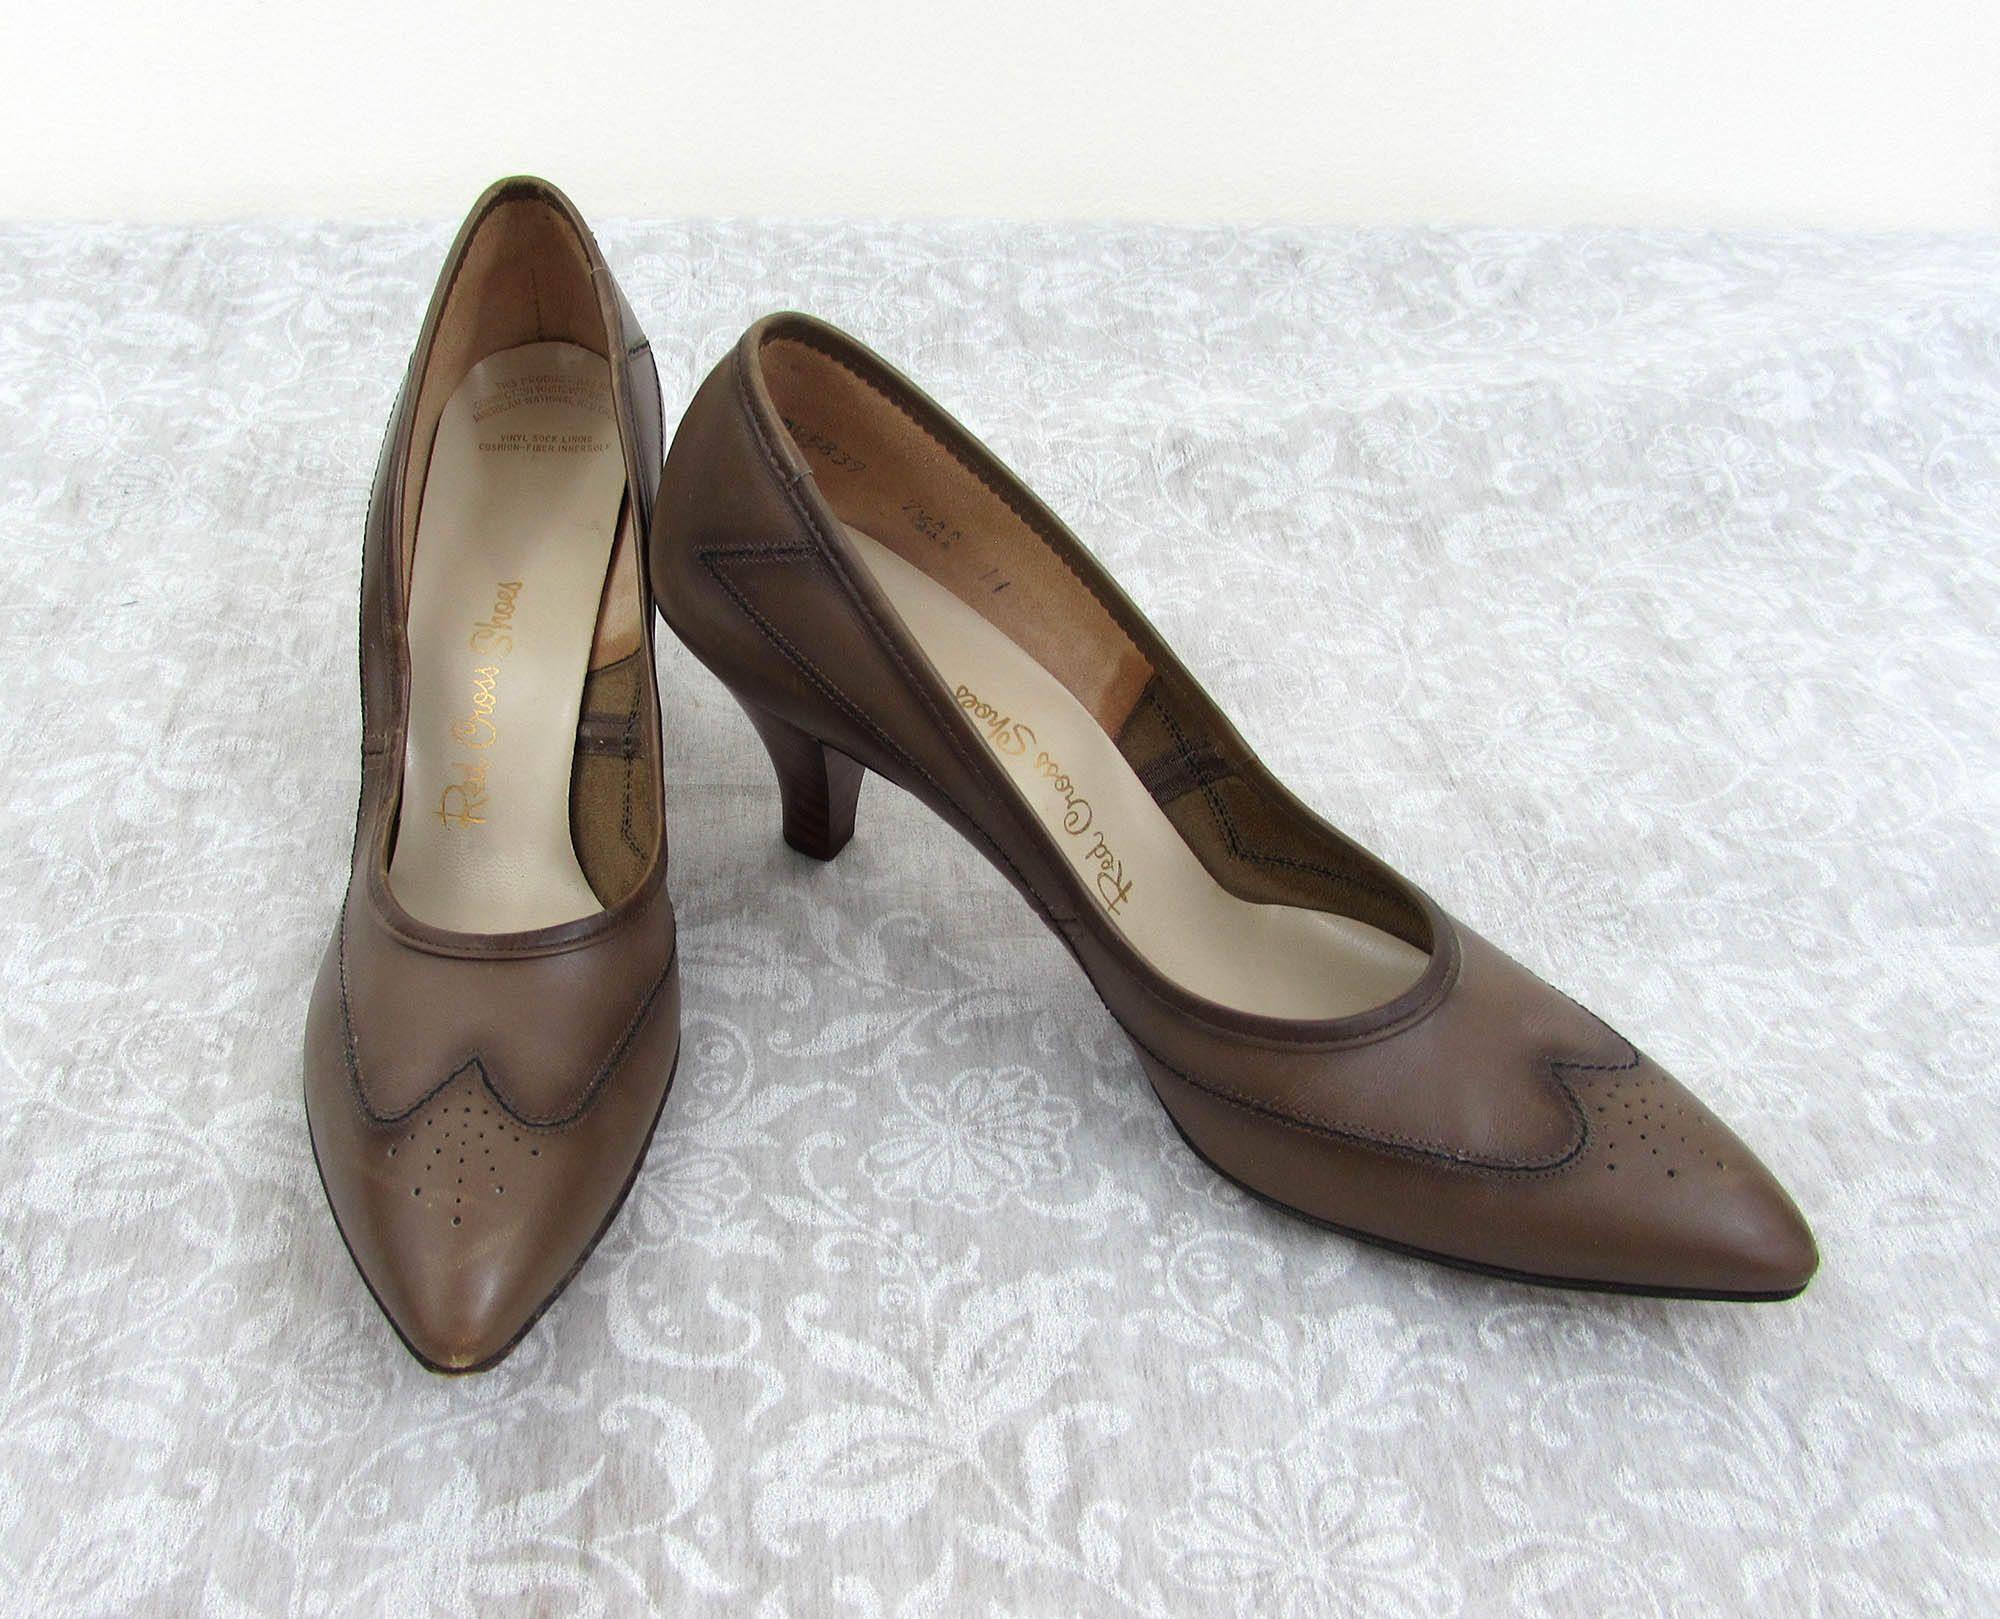 00da92965a242 Vintage Red Cross Heels Shoes - Light Brown Leather Pumps - 2.75 ...